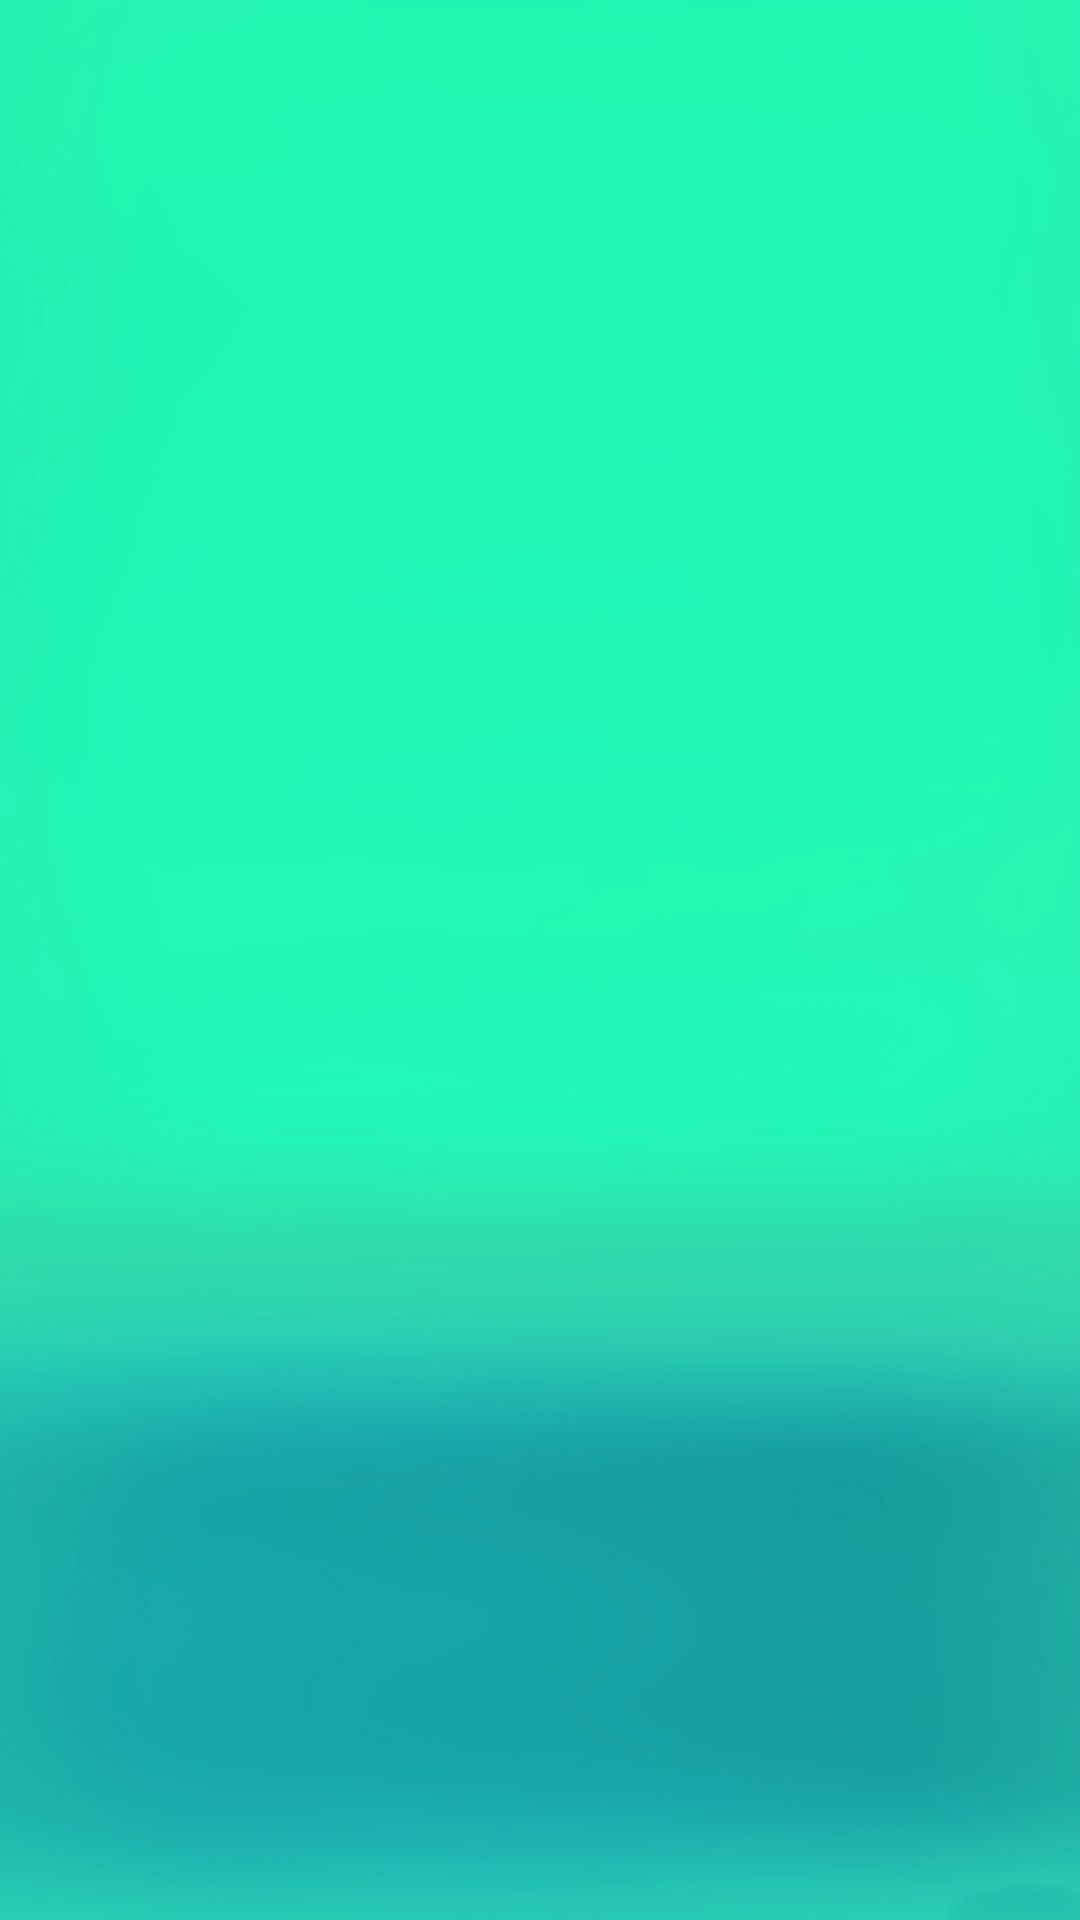 Green blue rothko gradation blur iphone 6 wallpaper - Color gradation wallpaper ...